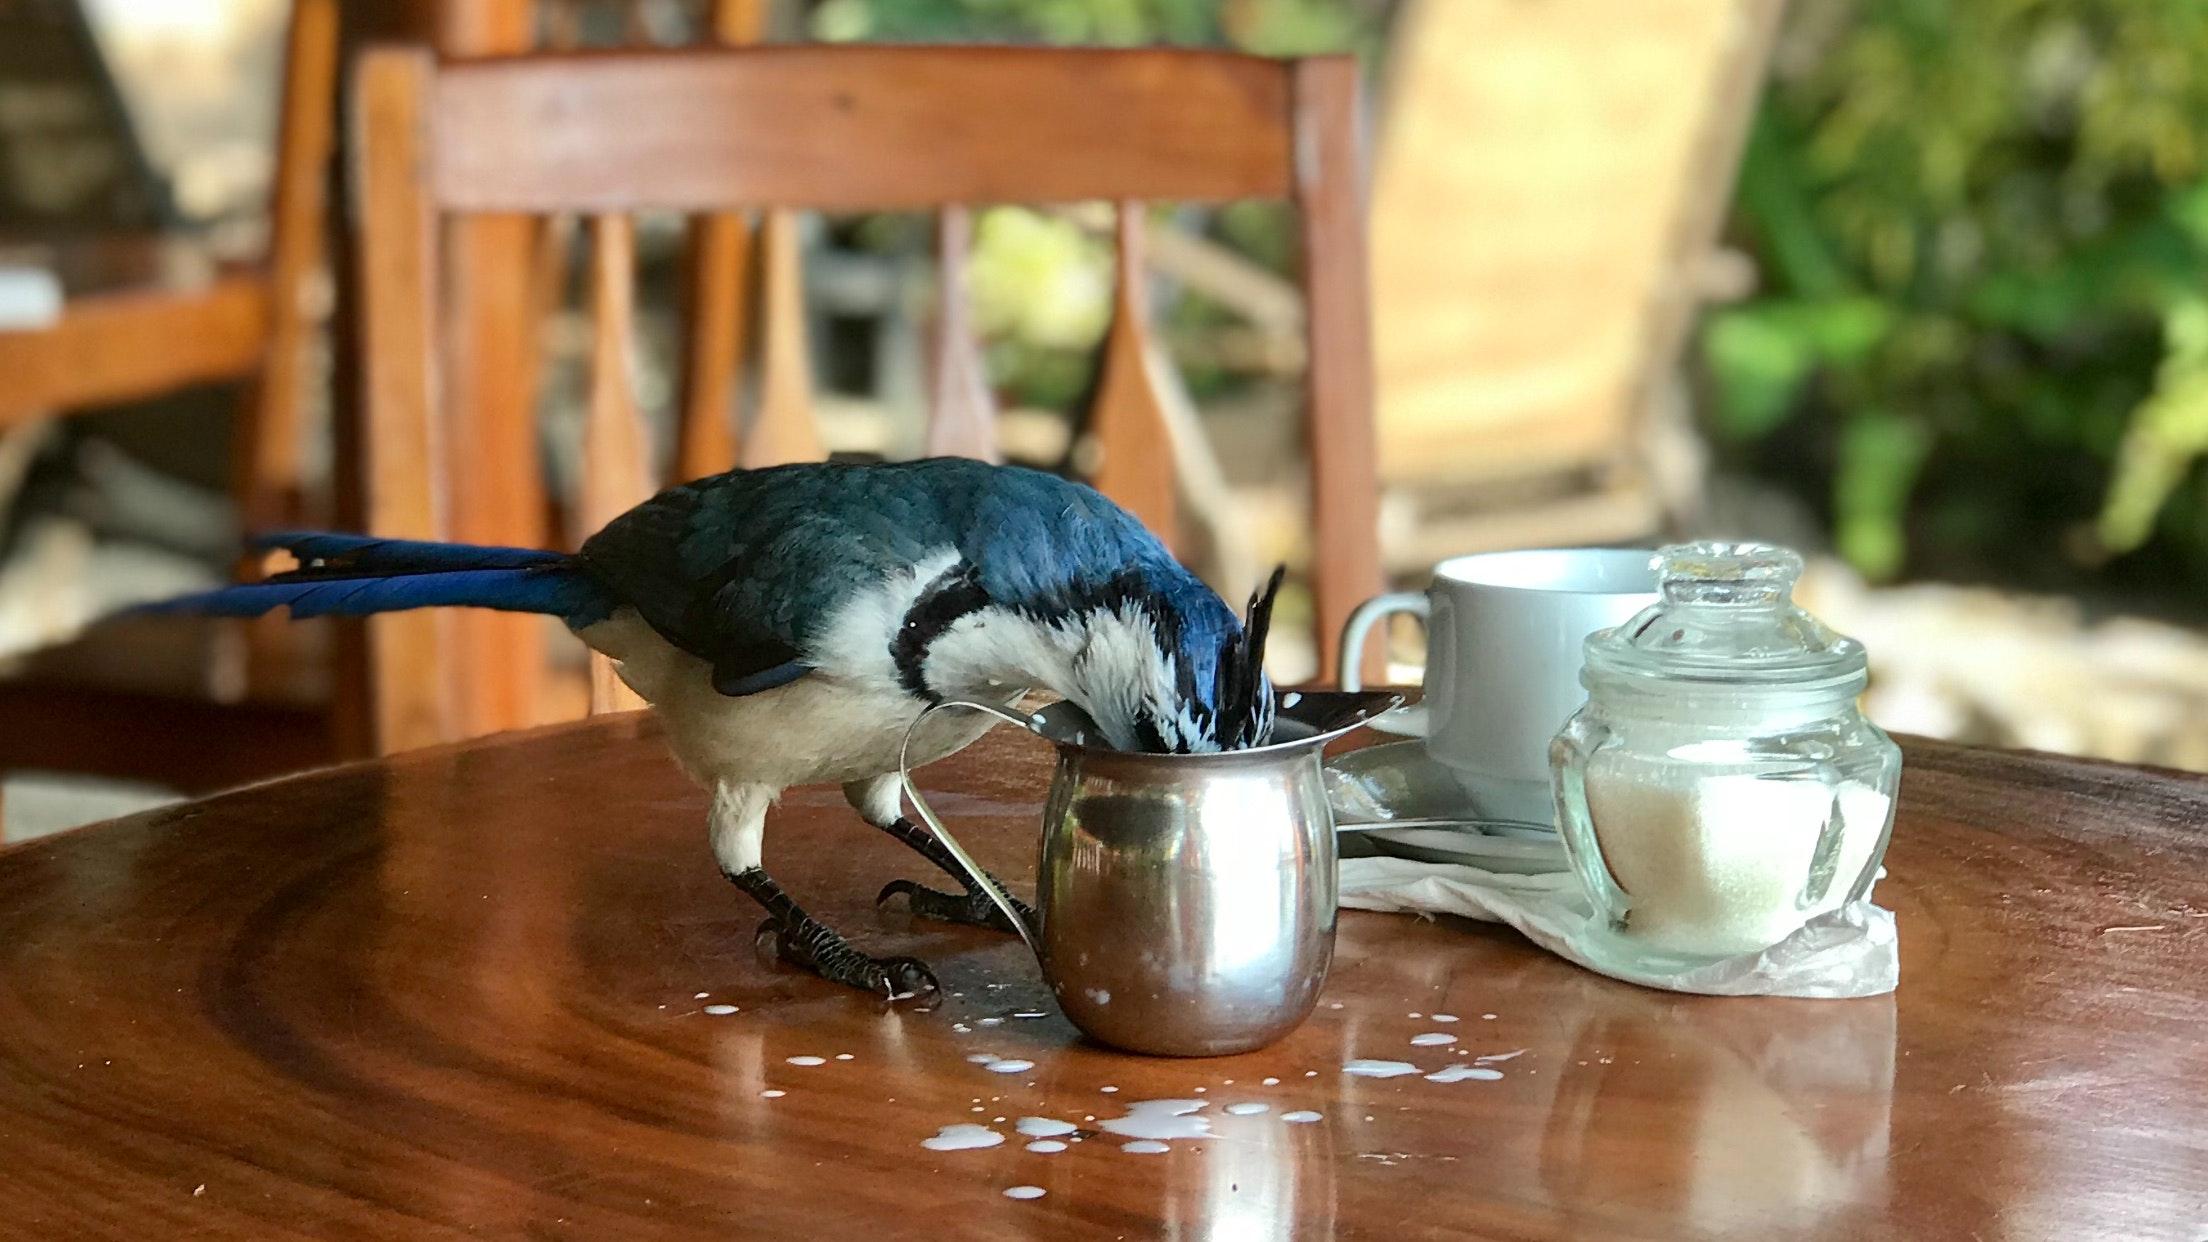 beverage-bird-breakfast-1058939